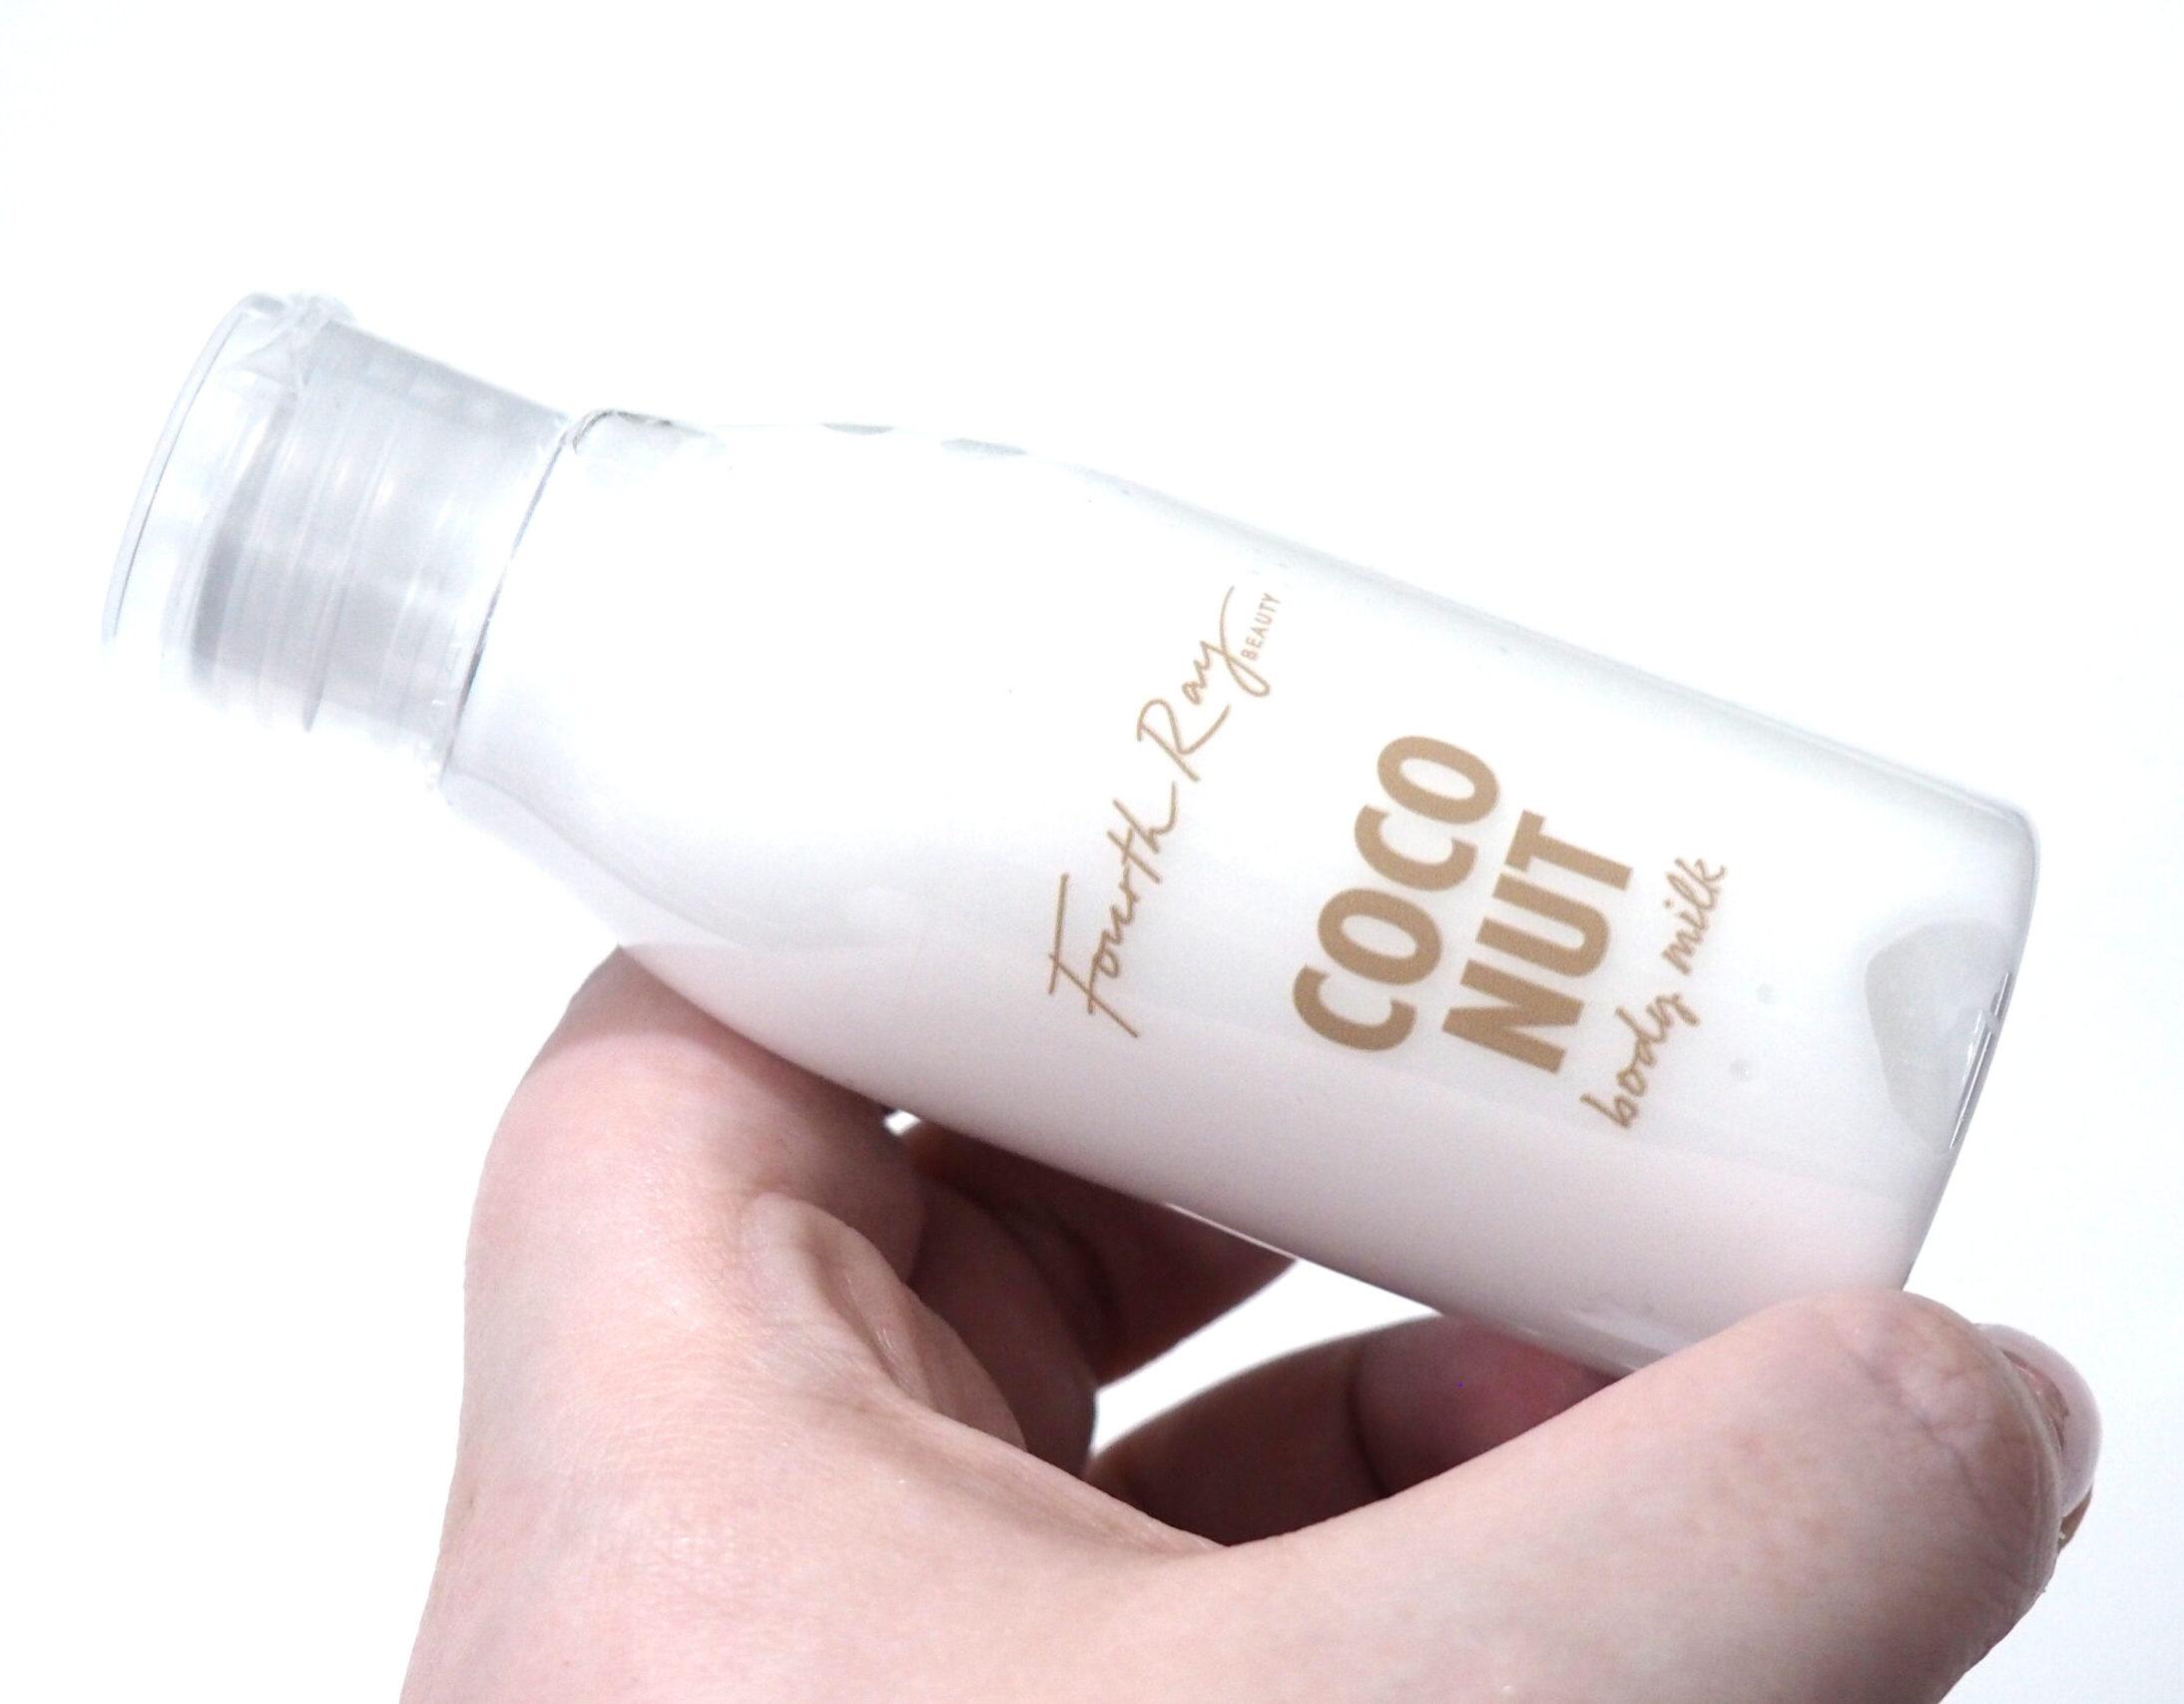 Fourth Ray Beauty Coconut Body Milk Review